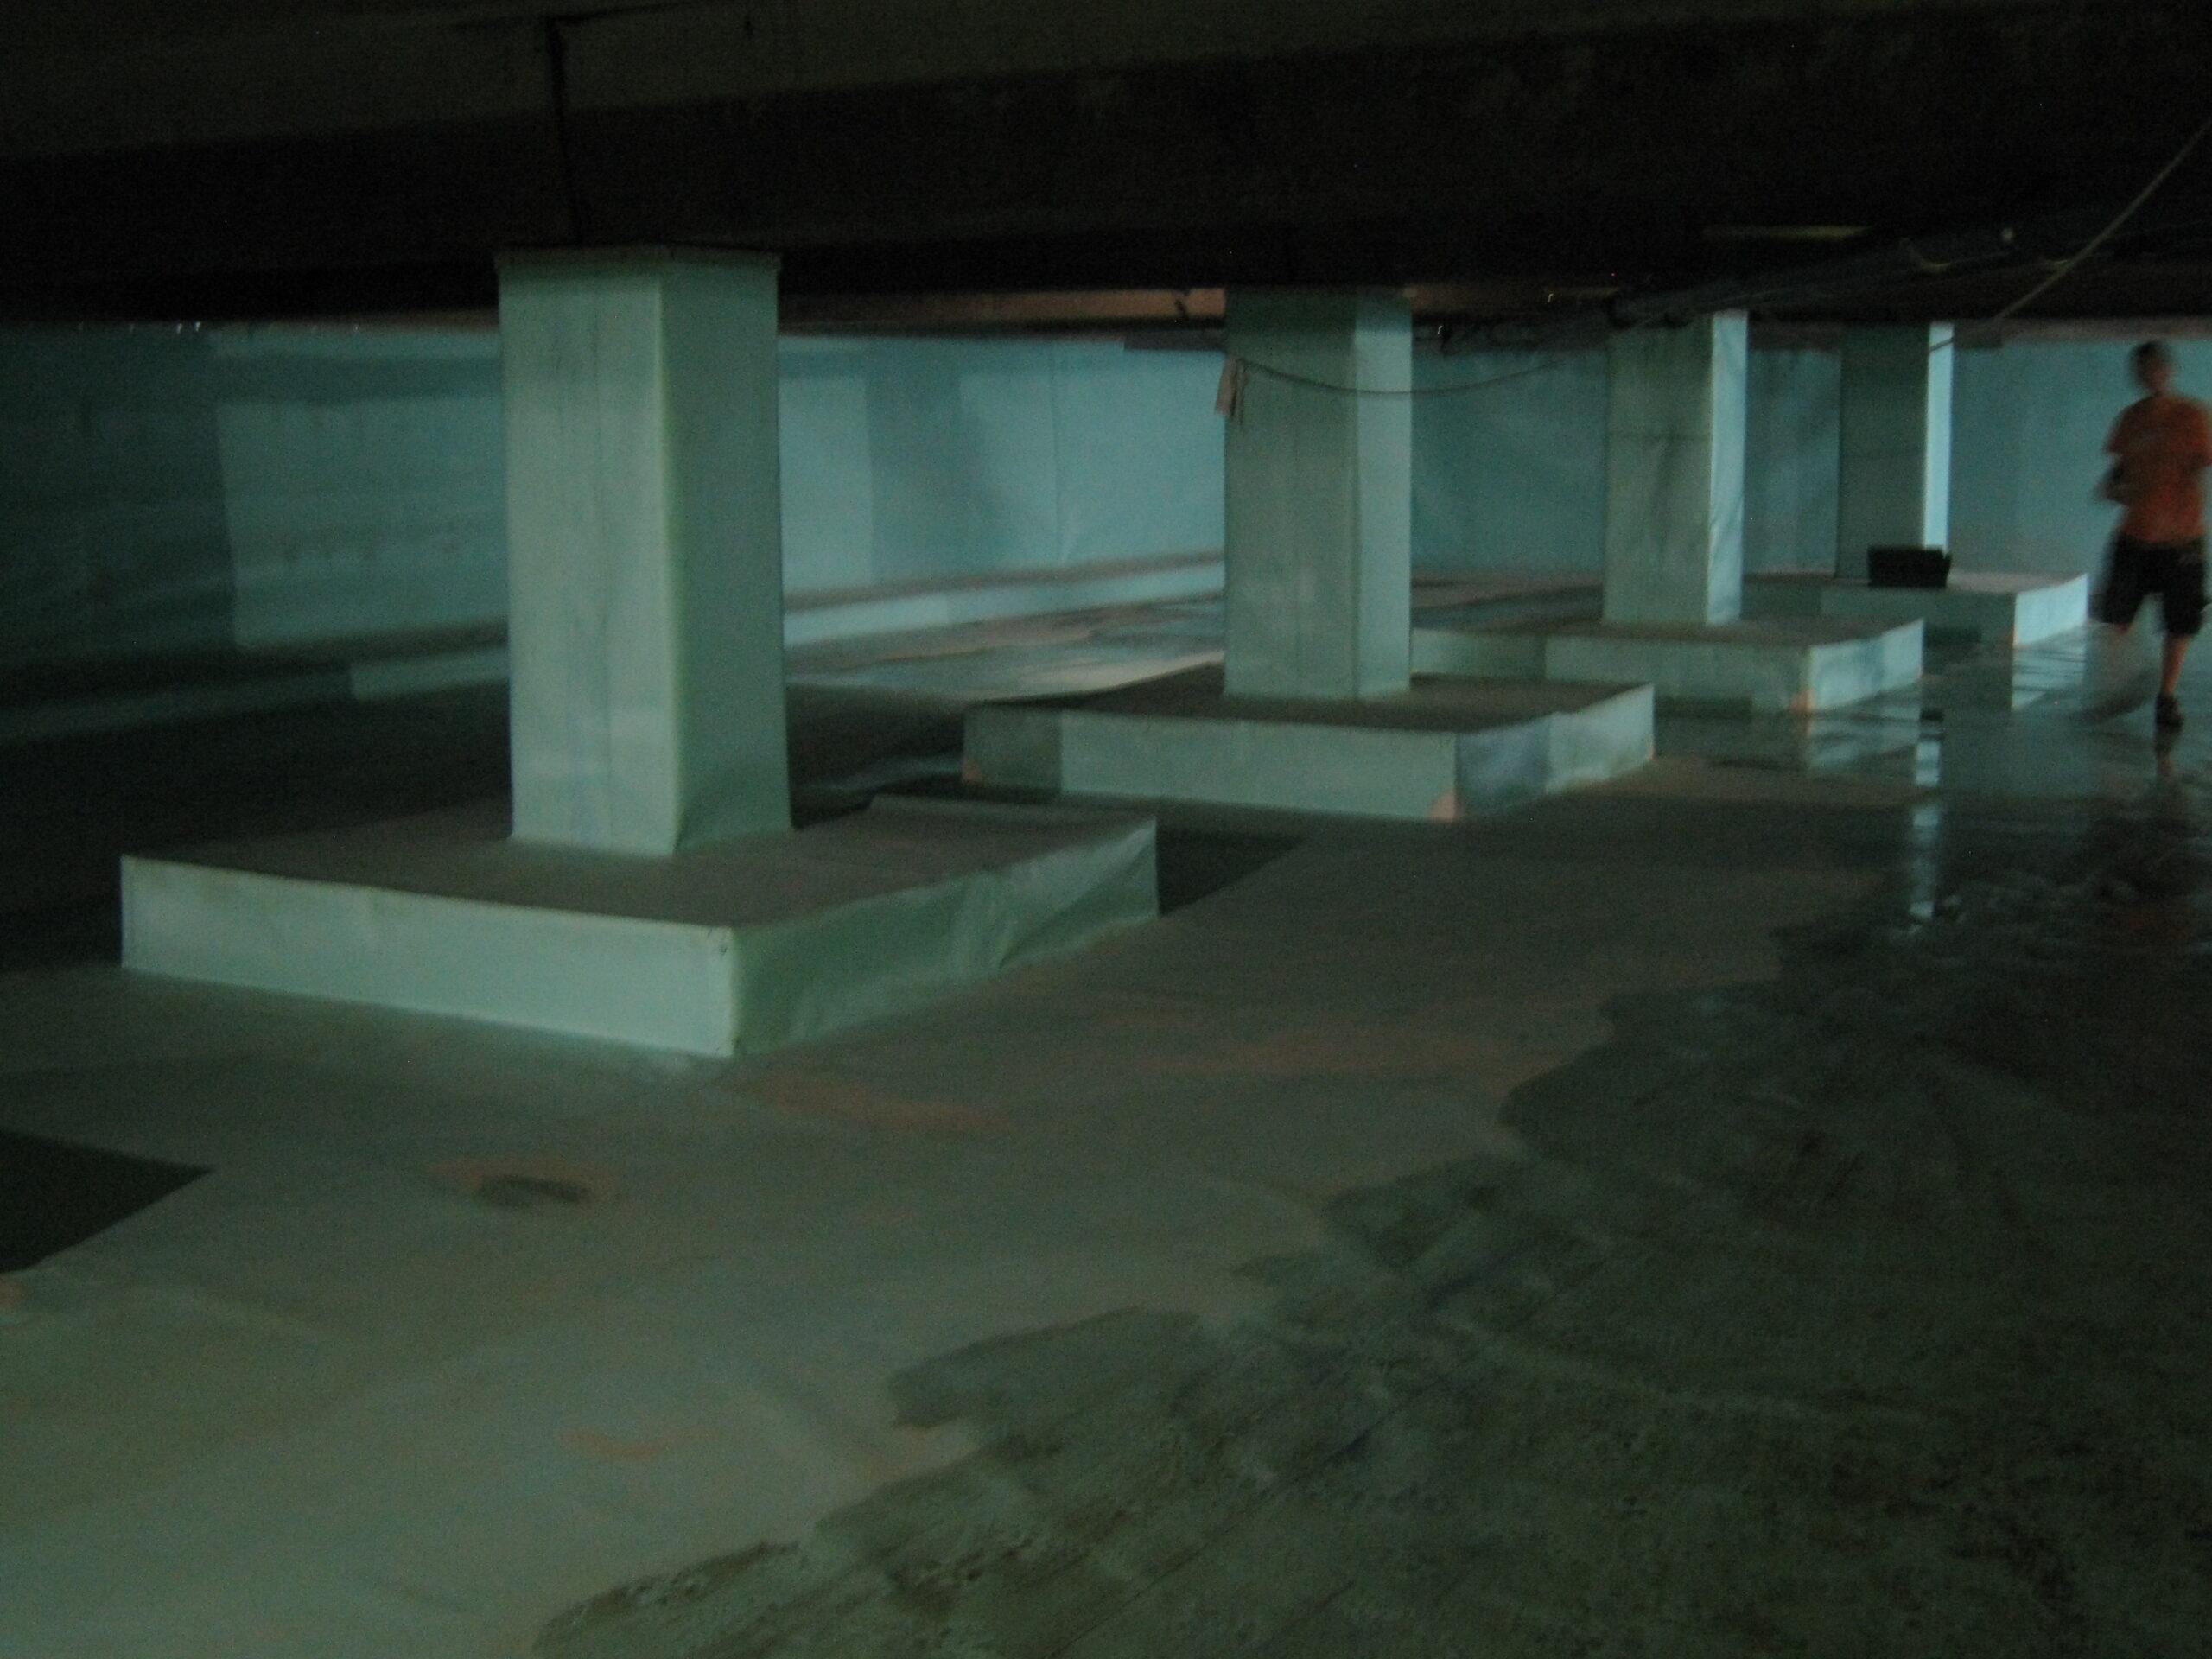 Water Tank Waterproofing   water tank waterproofing products   waterproofing concrete water tanks   water tank leakage chemical   drinking water tank waterproofing   sky chemical services